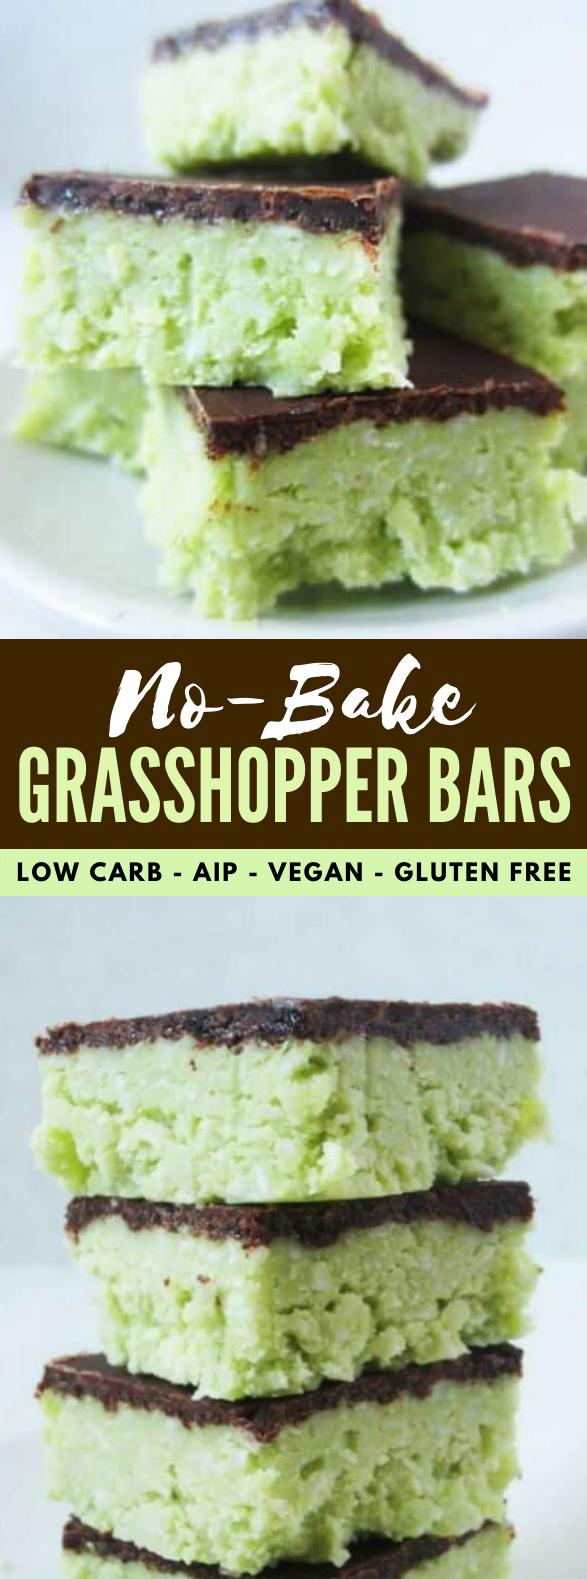 No-Bake Grasshopper Bars – low carb, AIP, vegan, & gluten free #diet #healthydessert